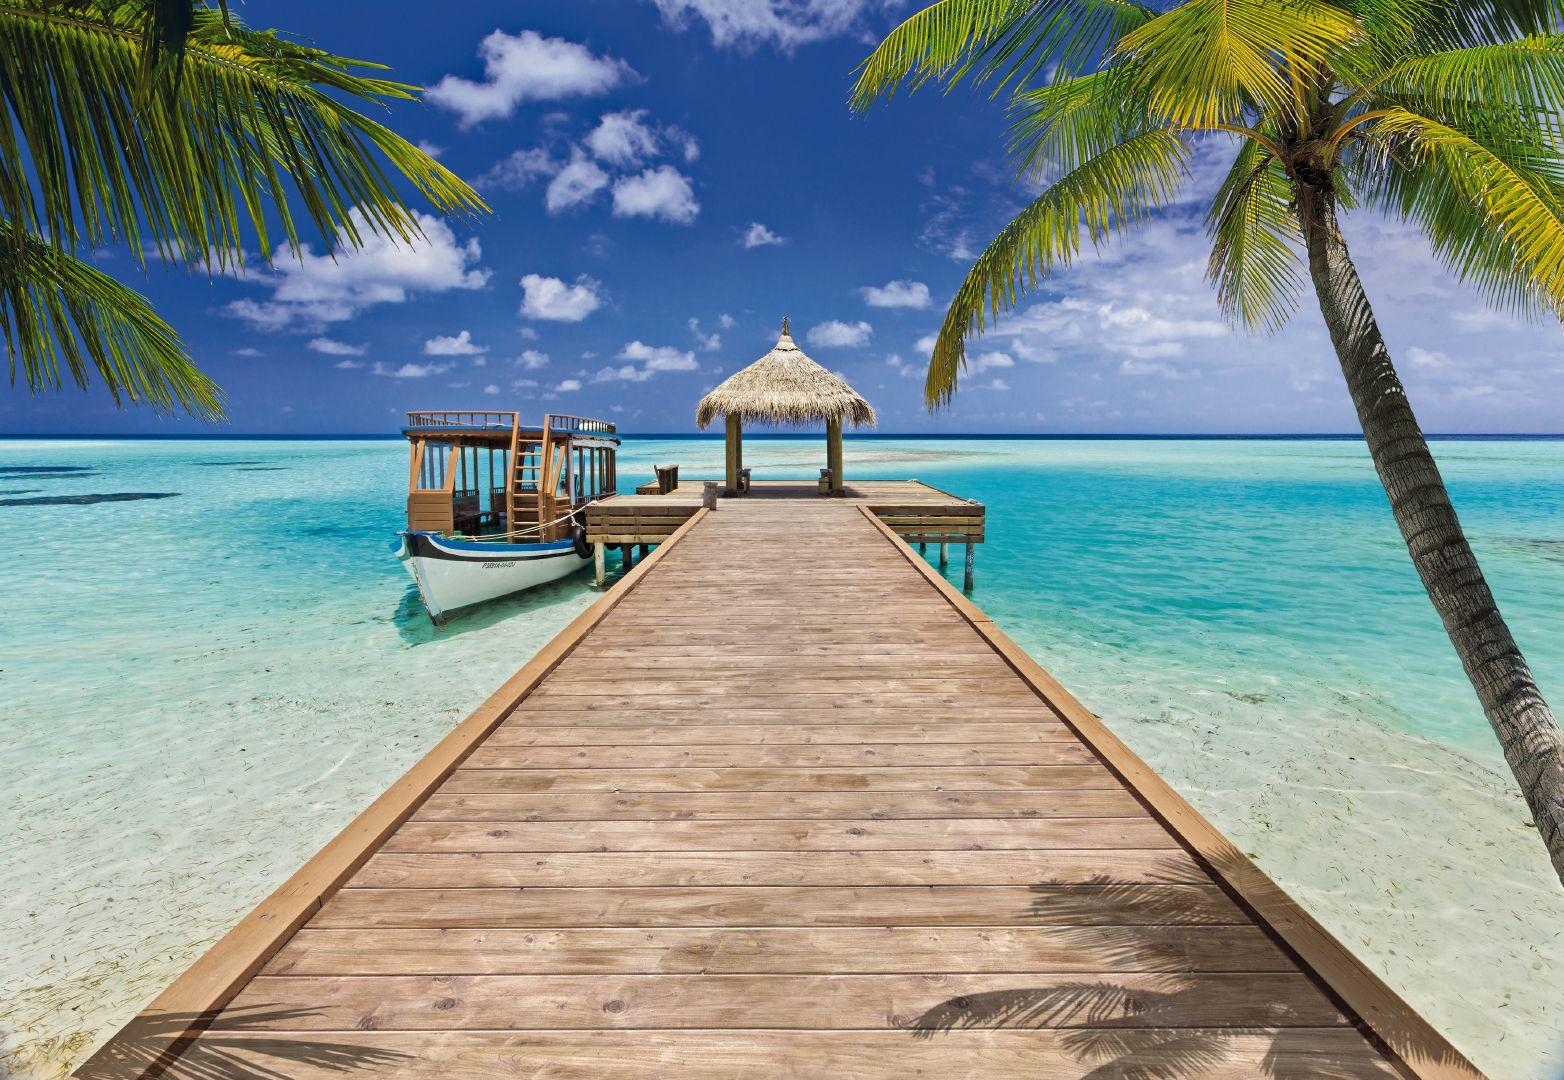 Картинки с видом пляжа